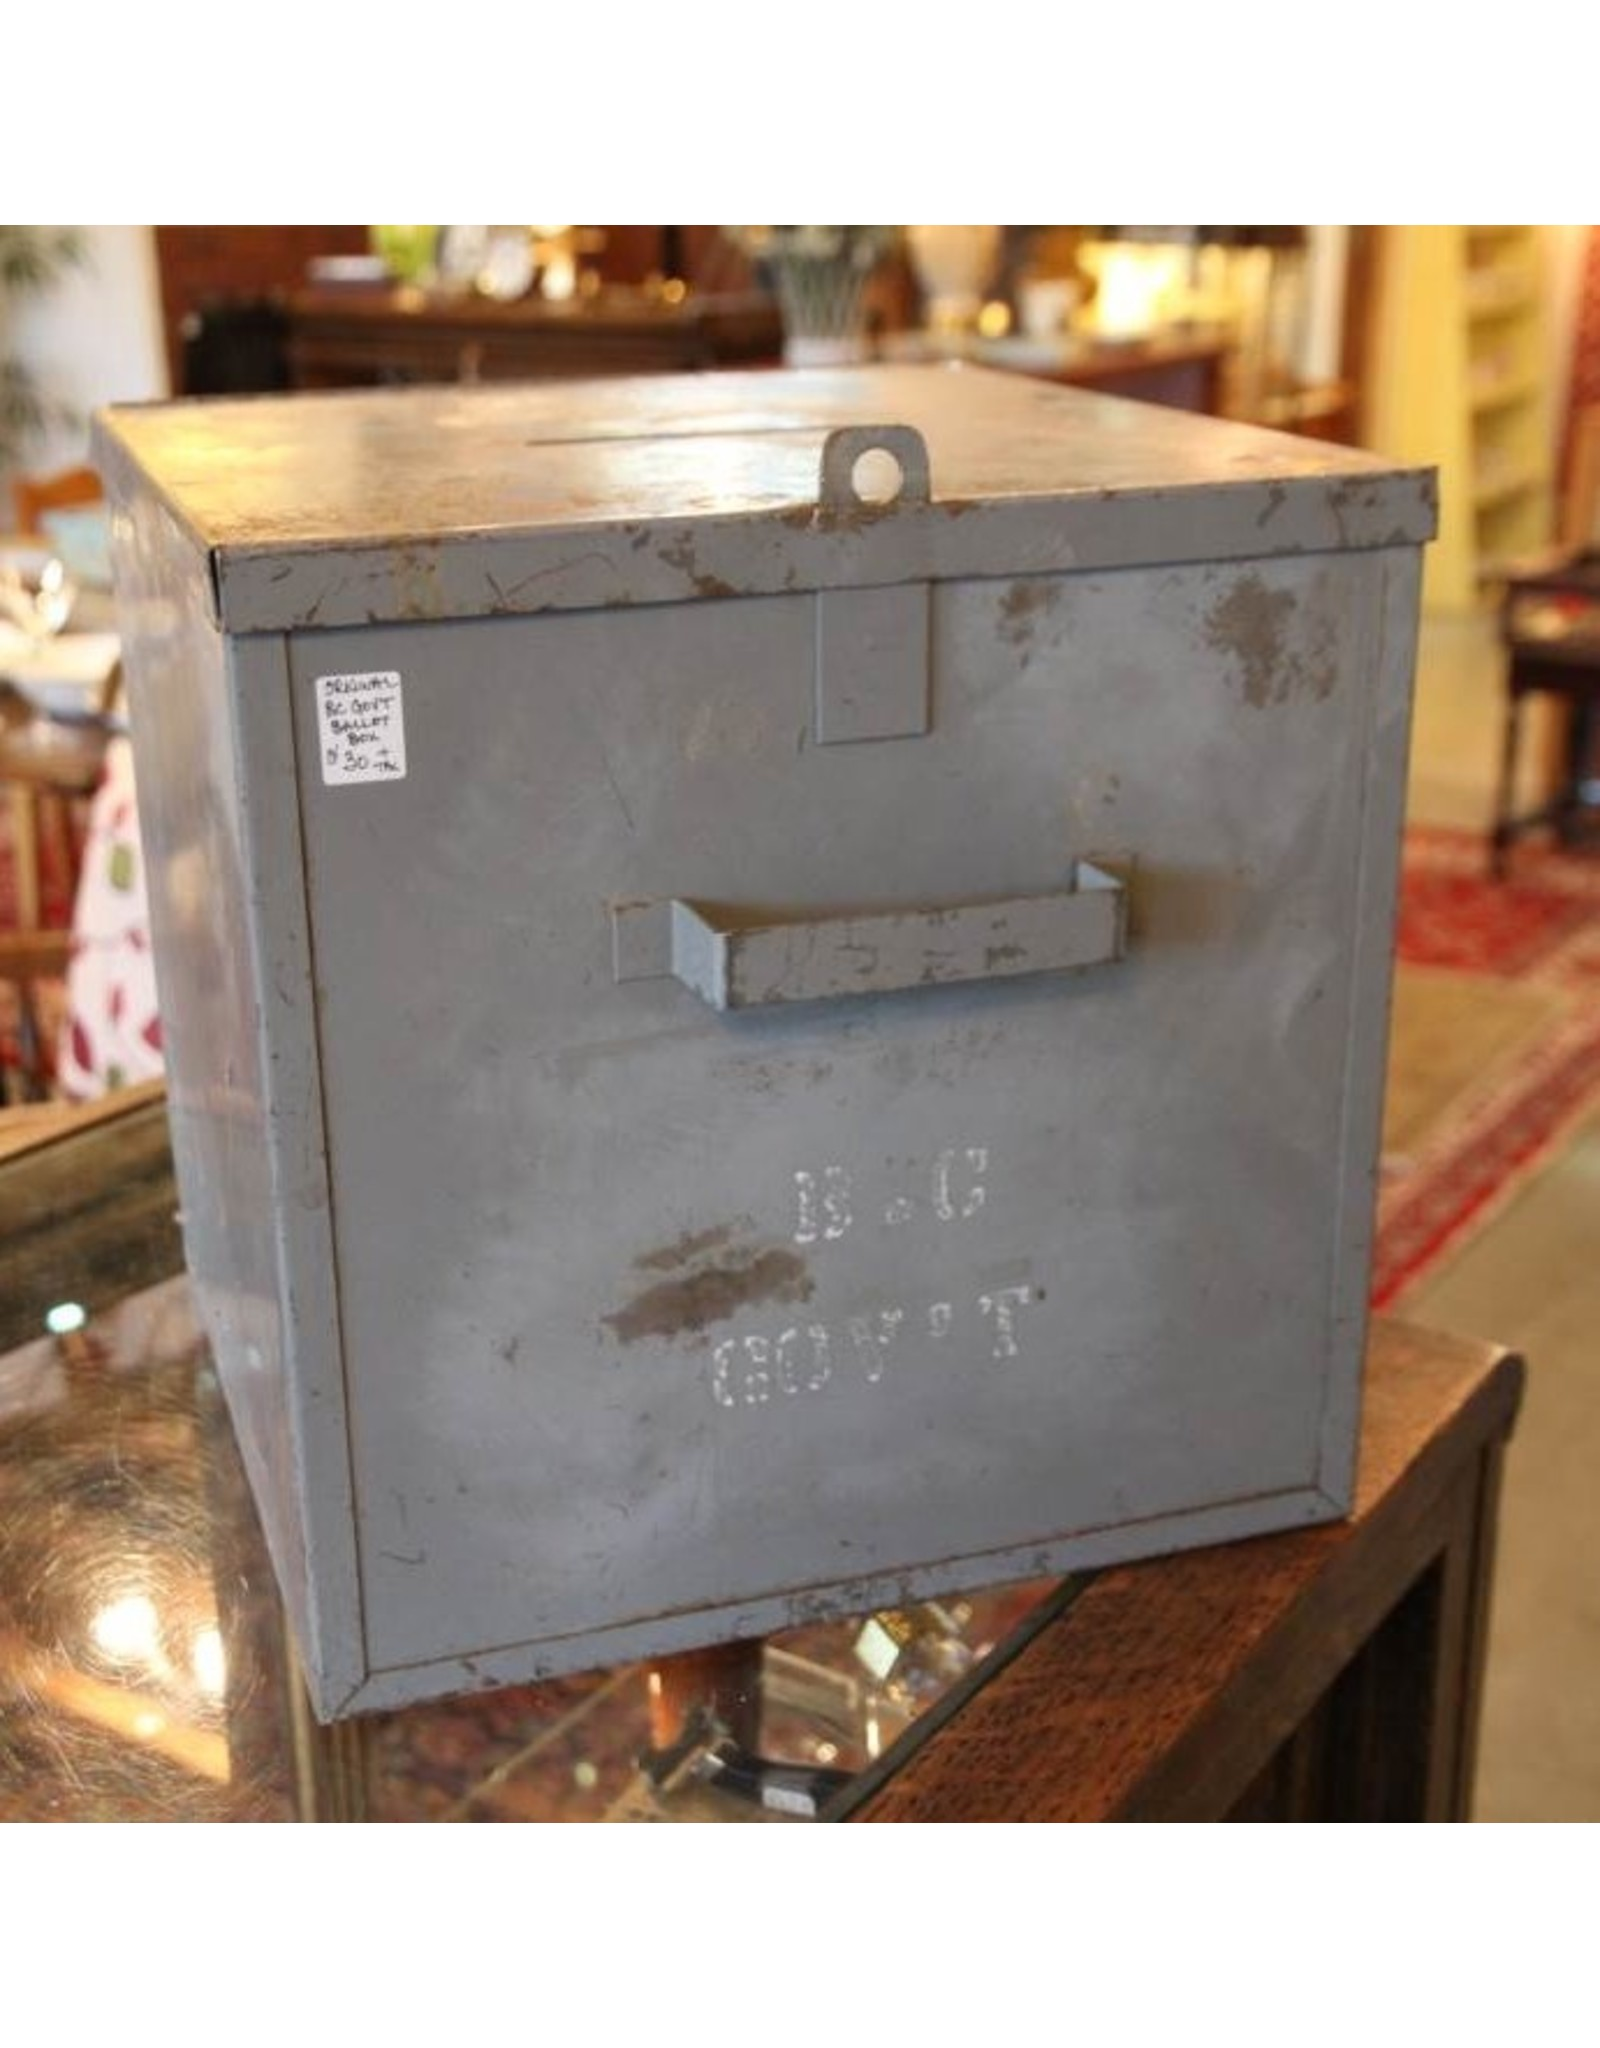 Ballot boxes - grey metal, BC government, fishermen